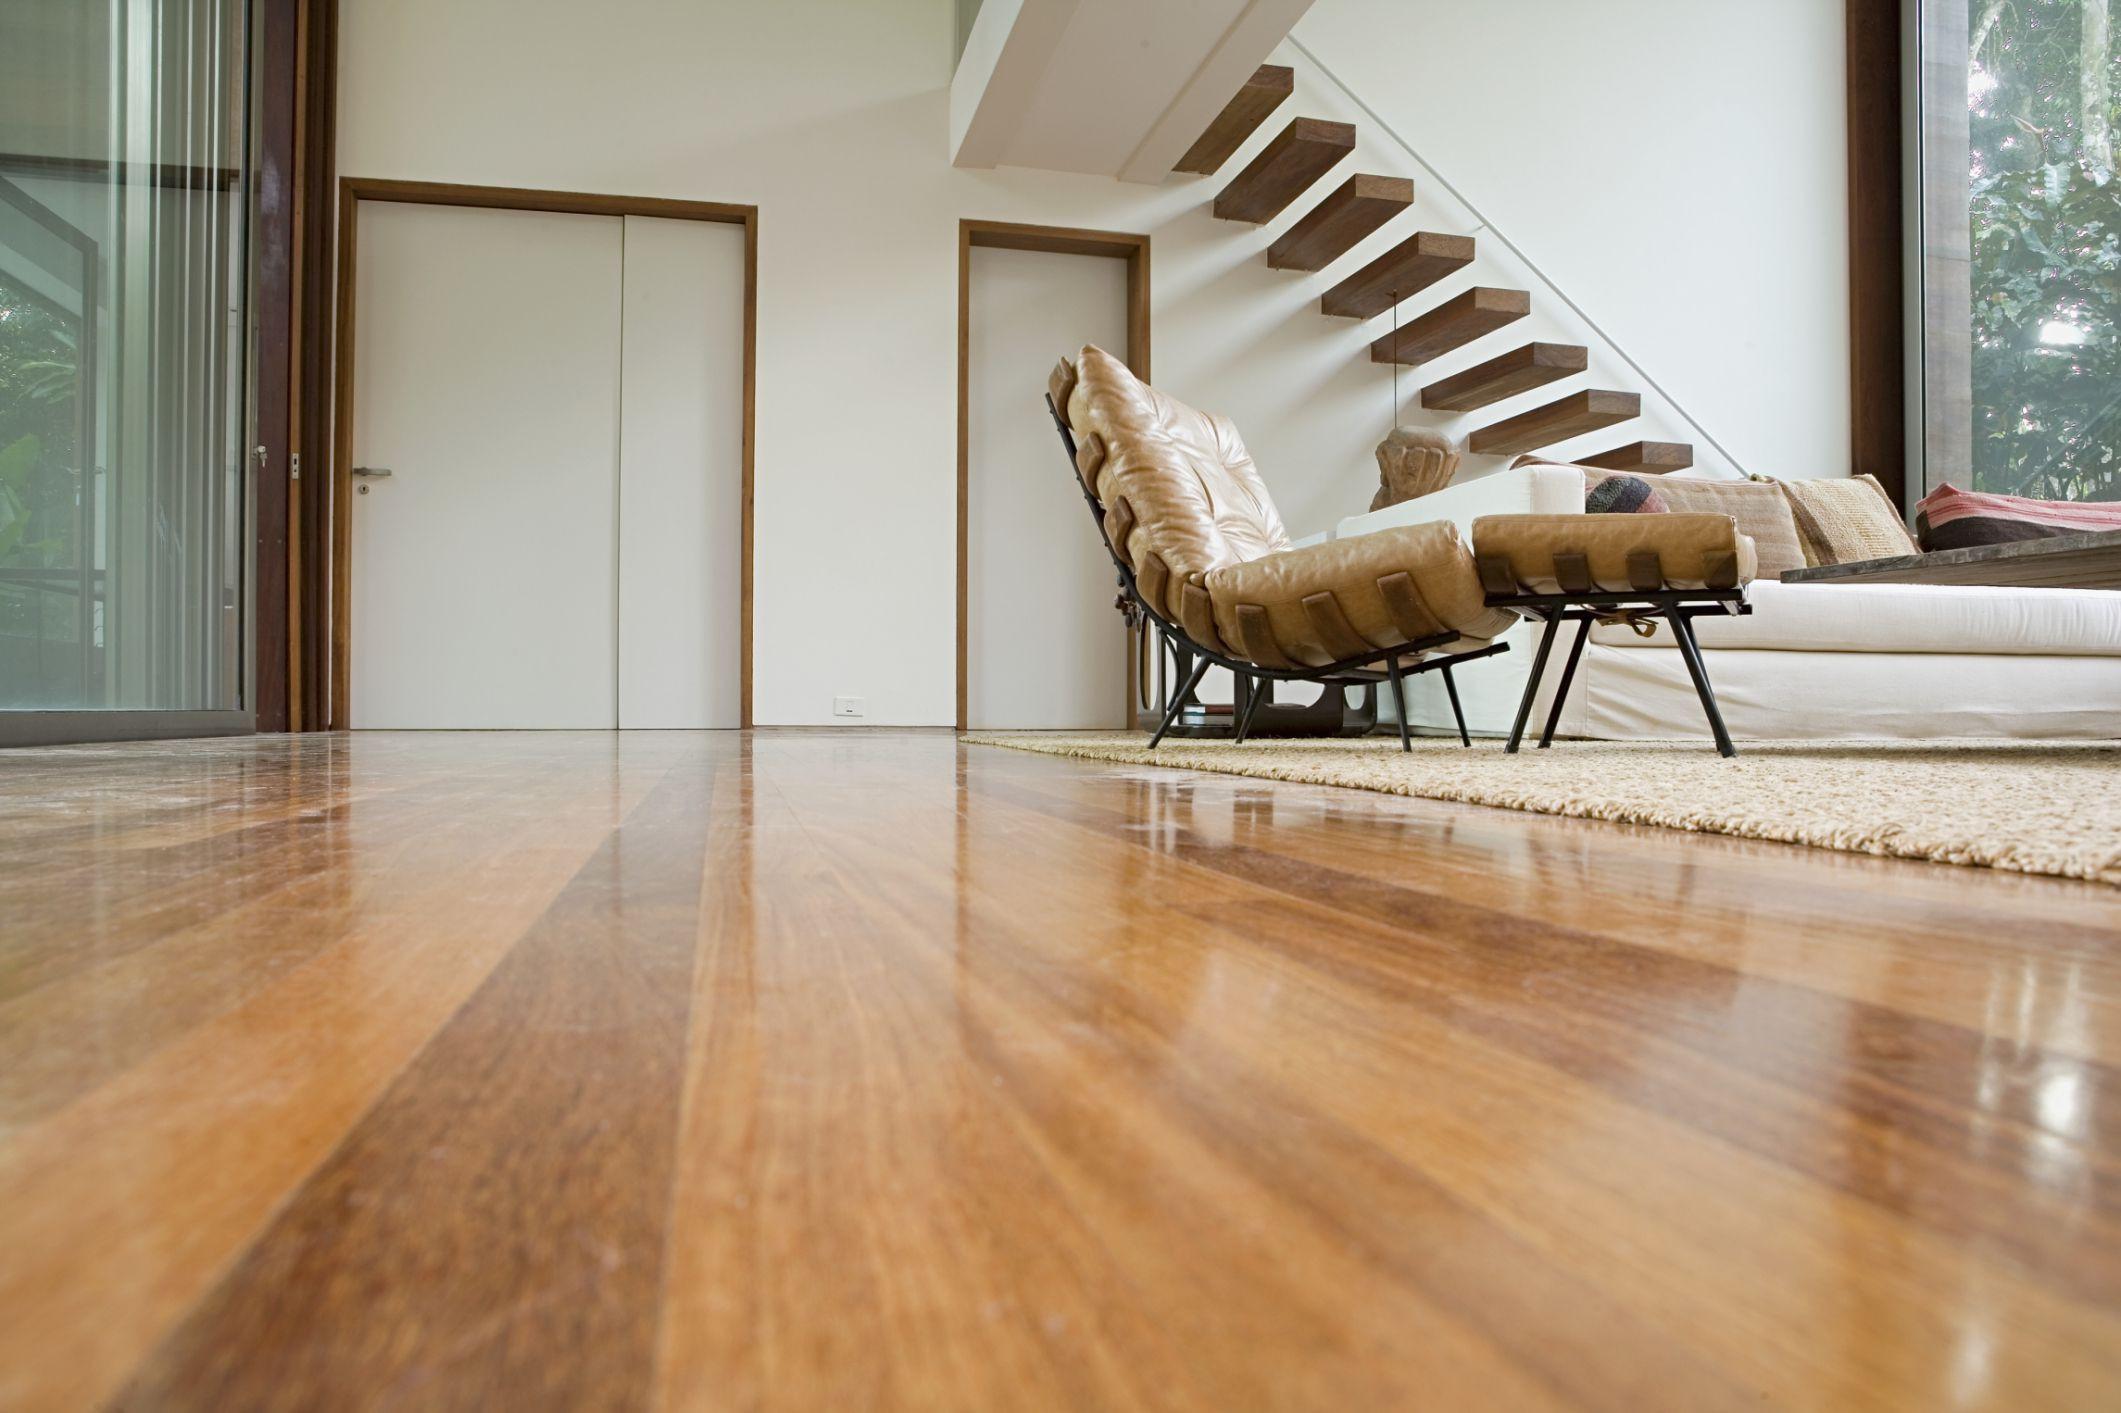 exotic hardwood flooring reviews of engineered wood flooring vs solid wood flooring throughout 200571260 001 highres 56a49dec5f9b58b7d0d7dc1e